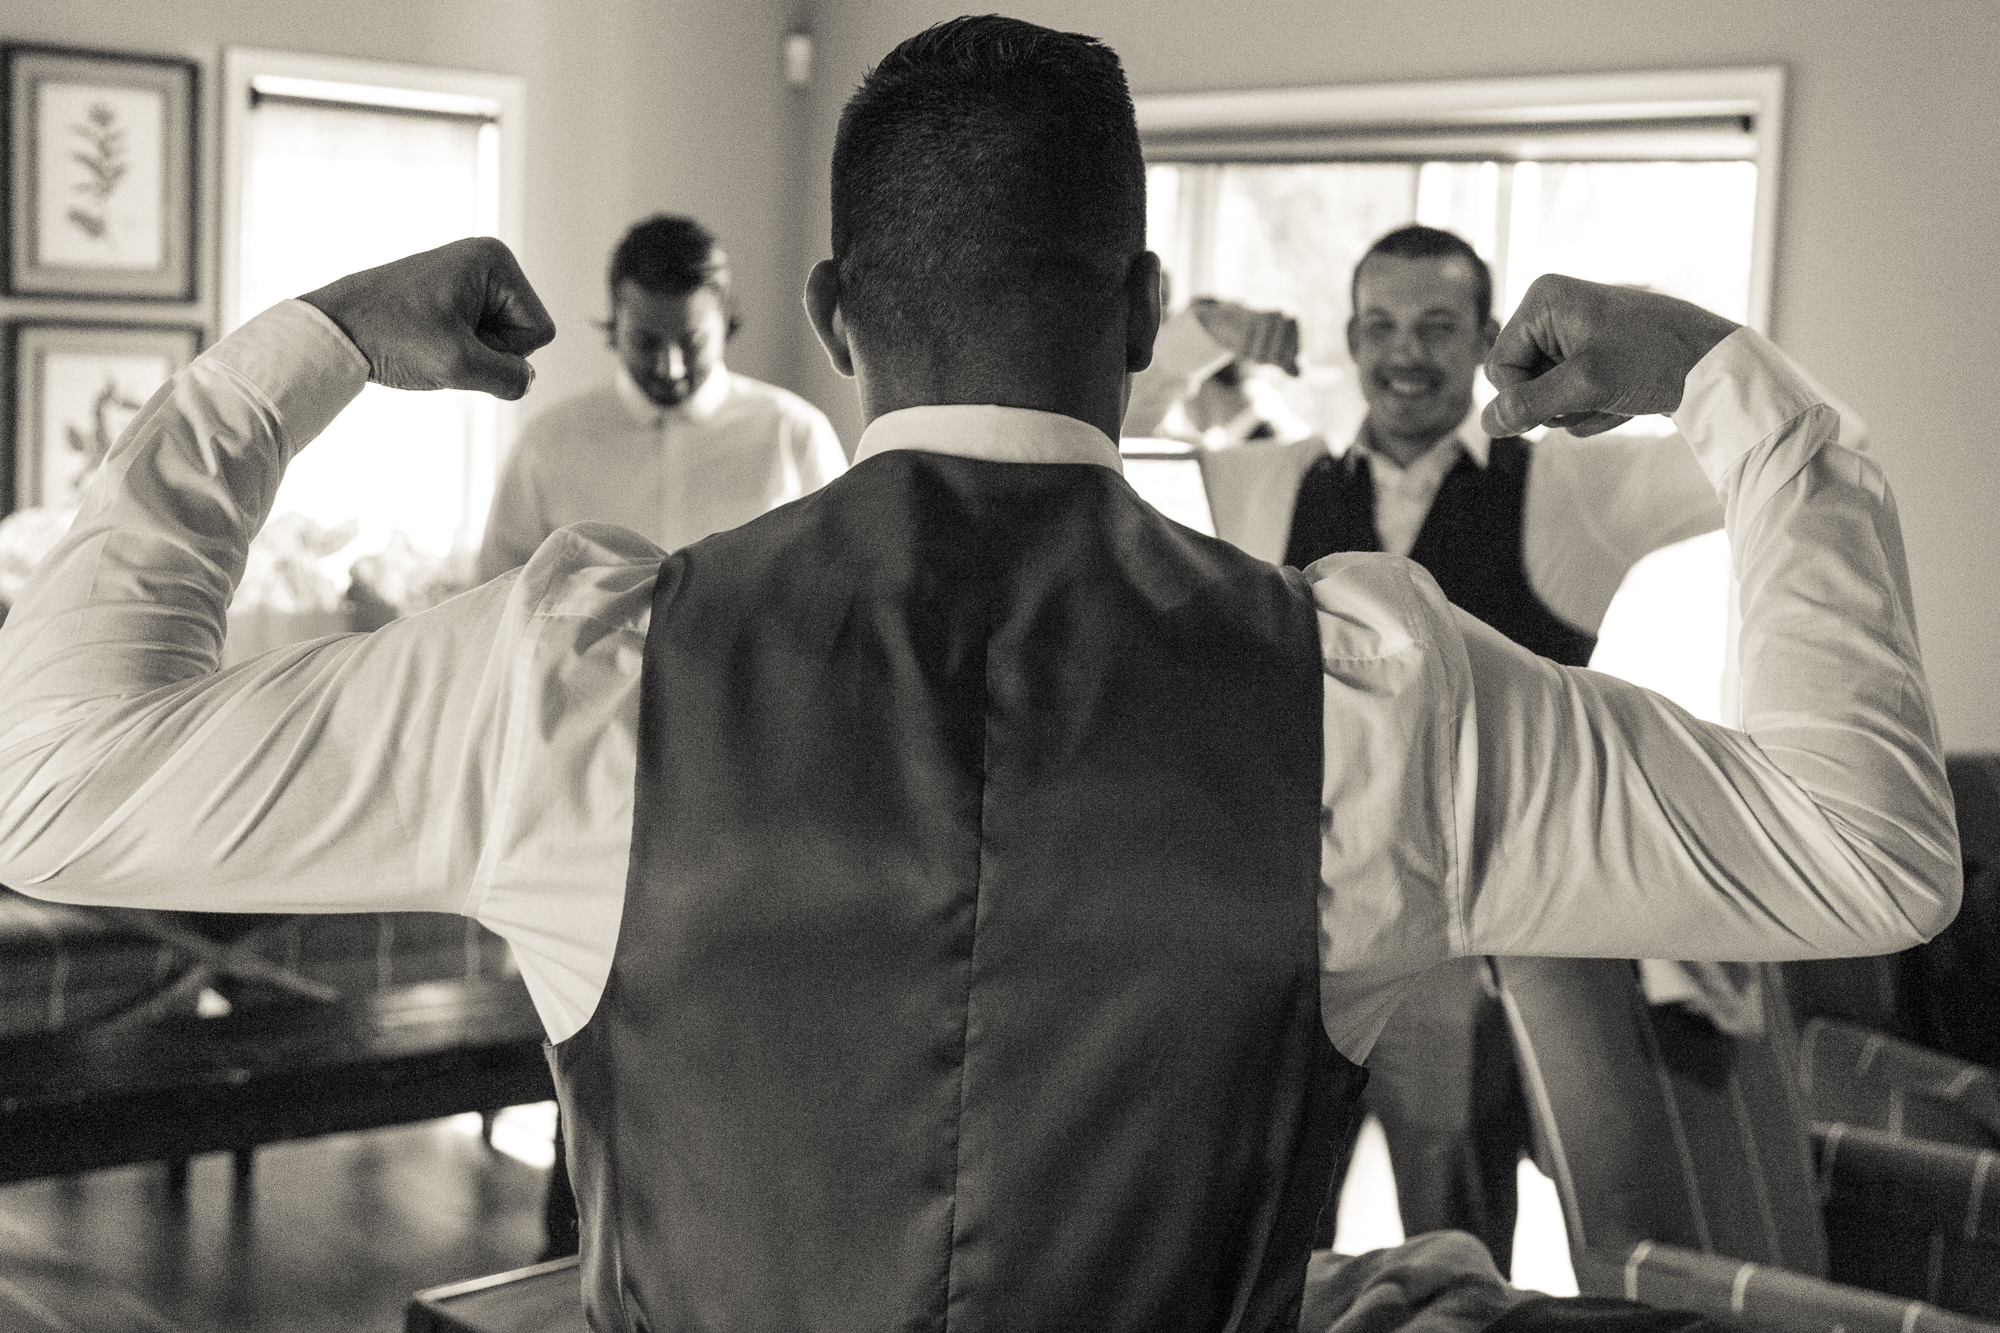 scranton-wedding-photography-zak-zavada-poconos--mattRachel-004.jpg